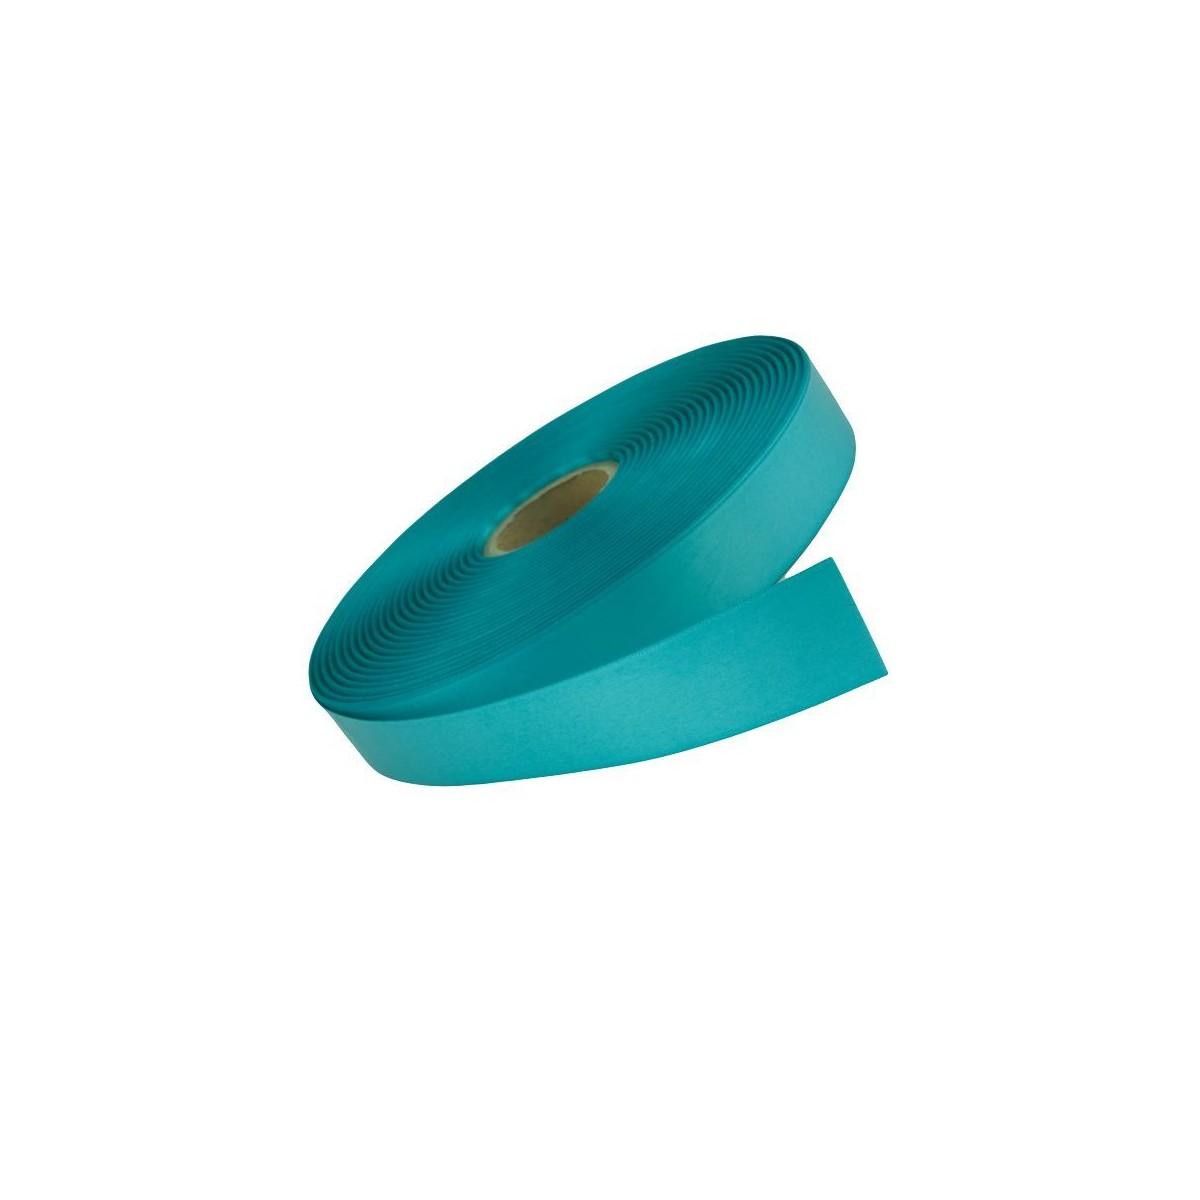 Ruban Satin Turquoise 6mm - 25m